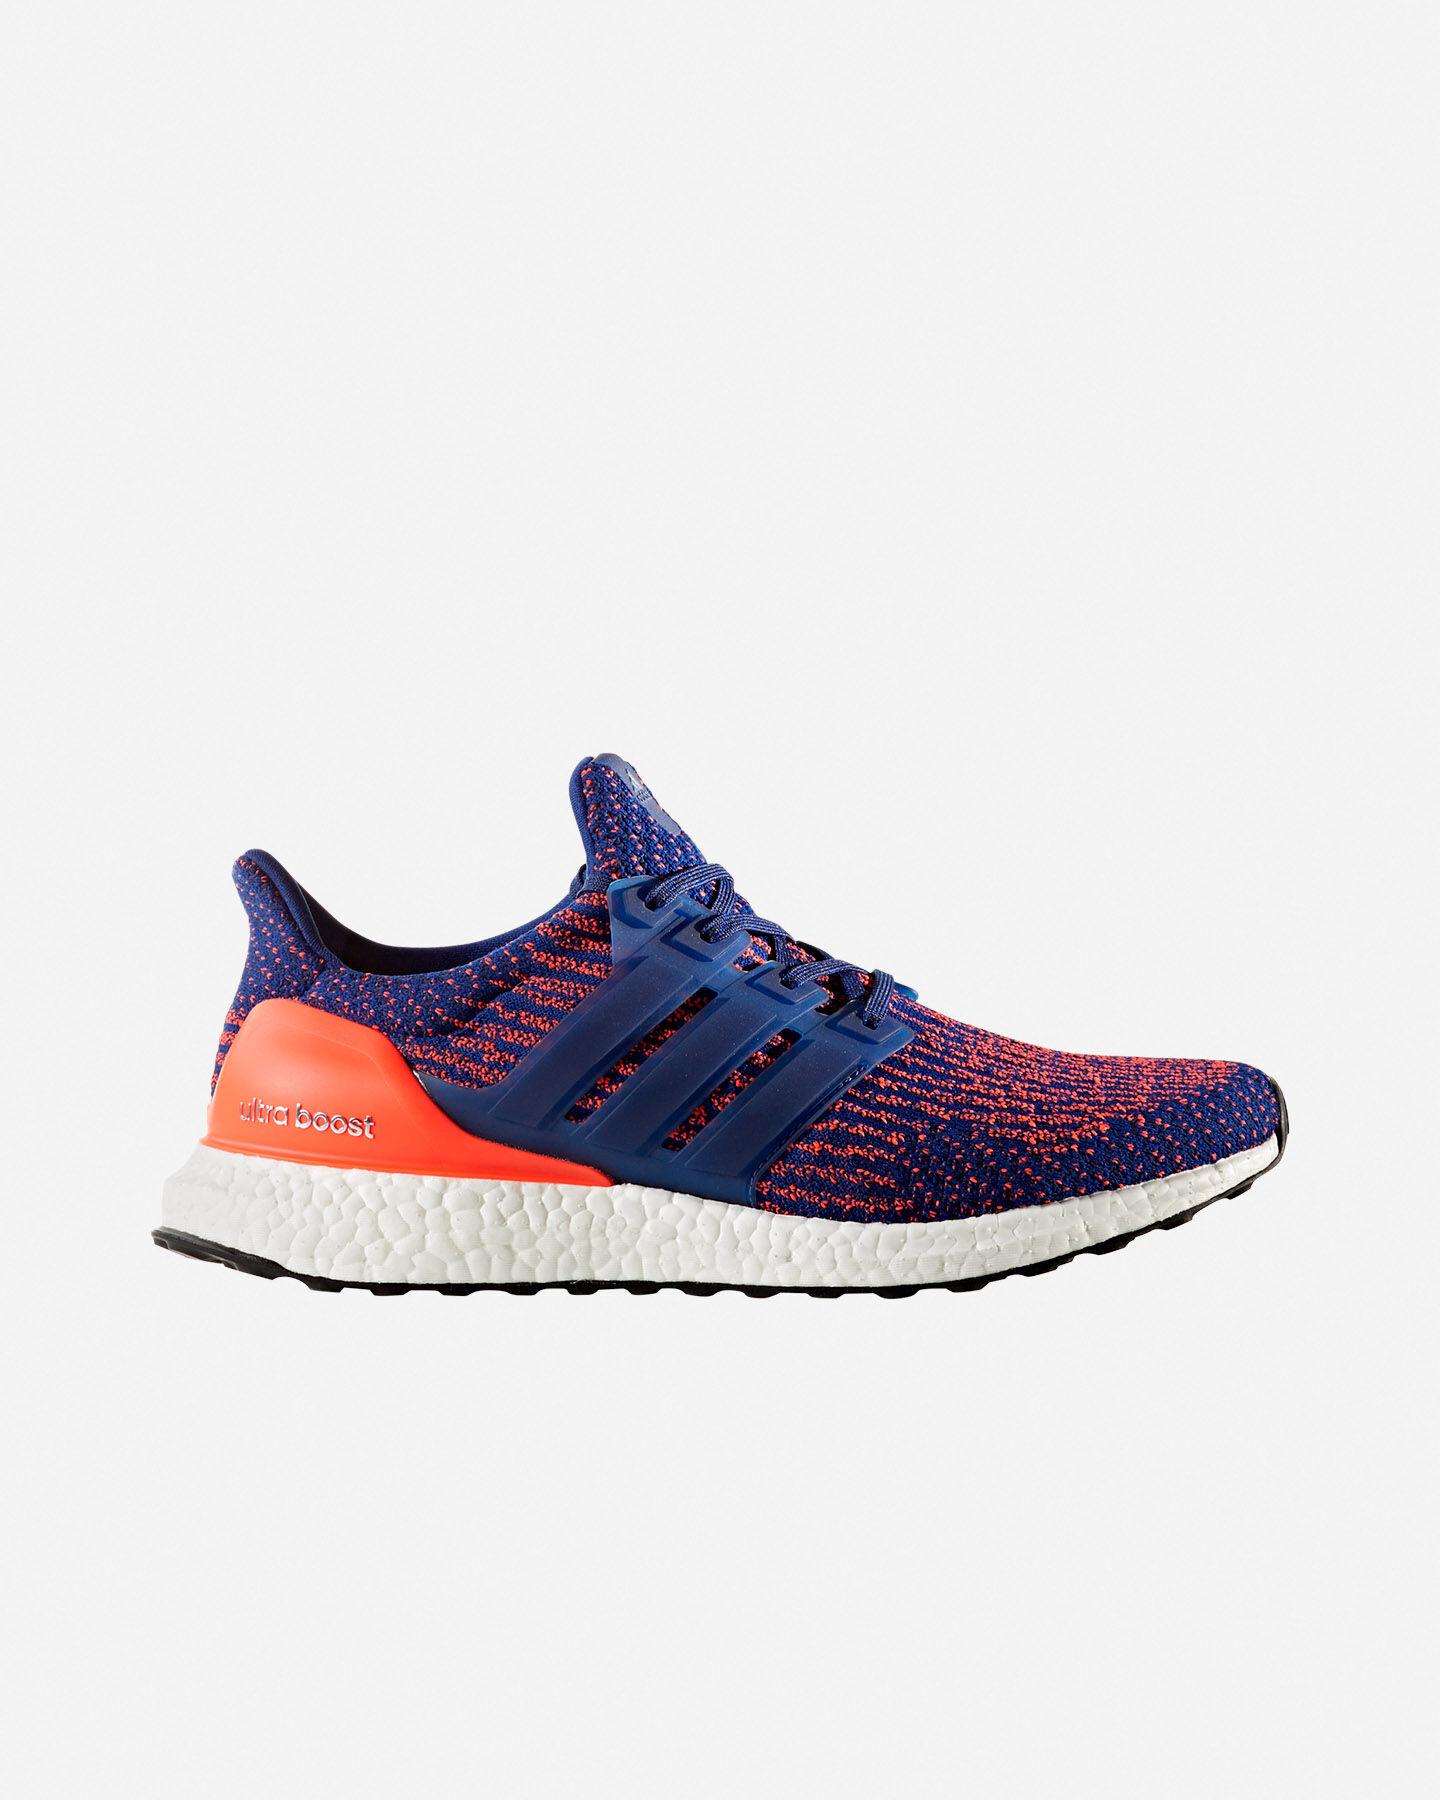 buy online f615f a7c0c scarpe tipo adidas ultra boost 3.0